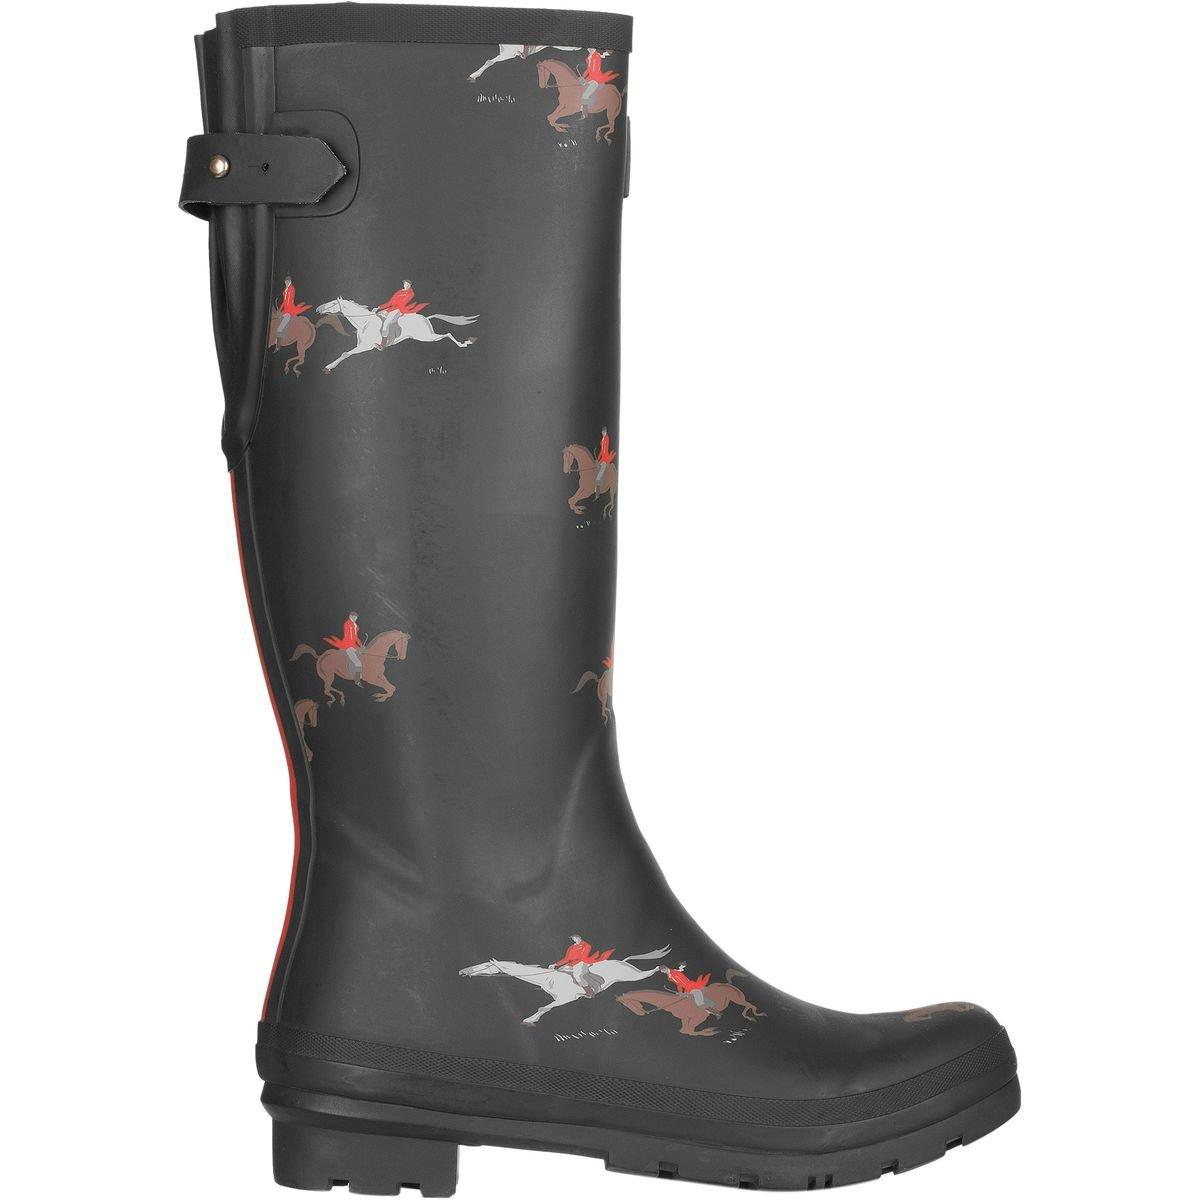 Joules Women's Ajusta Rain Boot B06VTXJNR9 8 B(M) US|Olive Horse